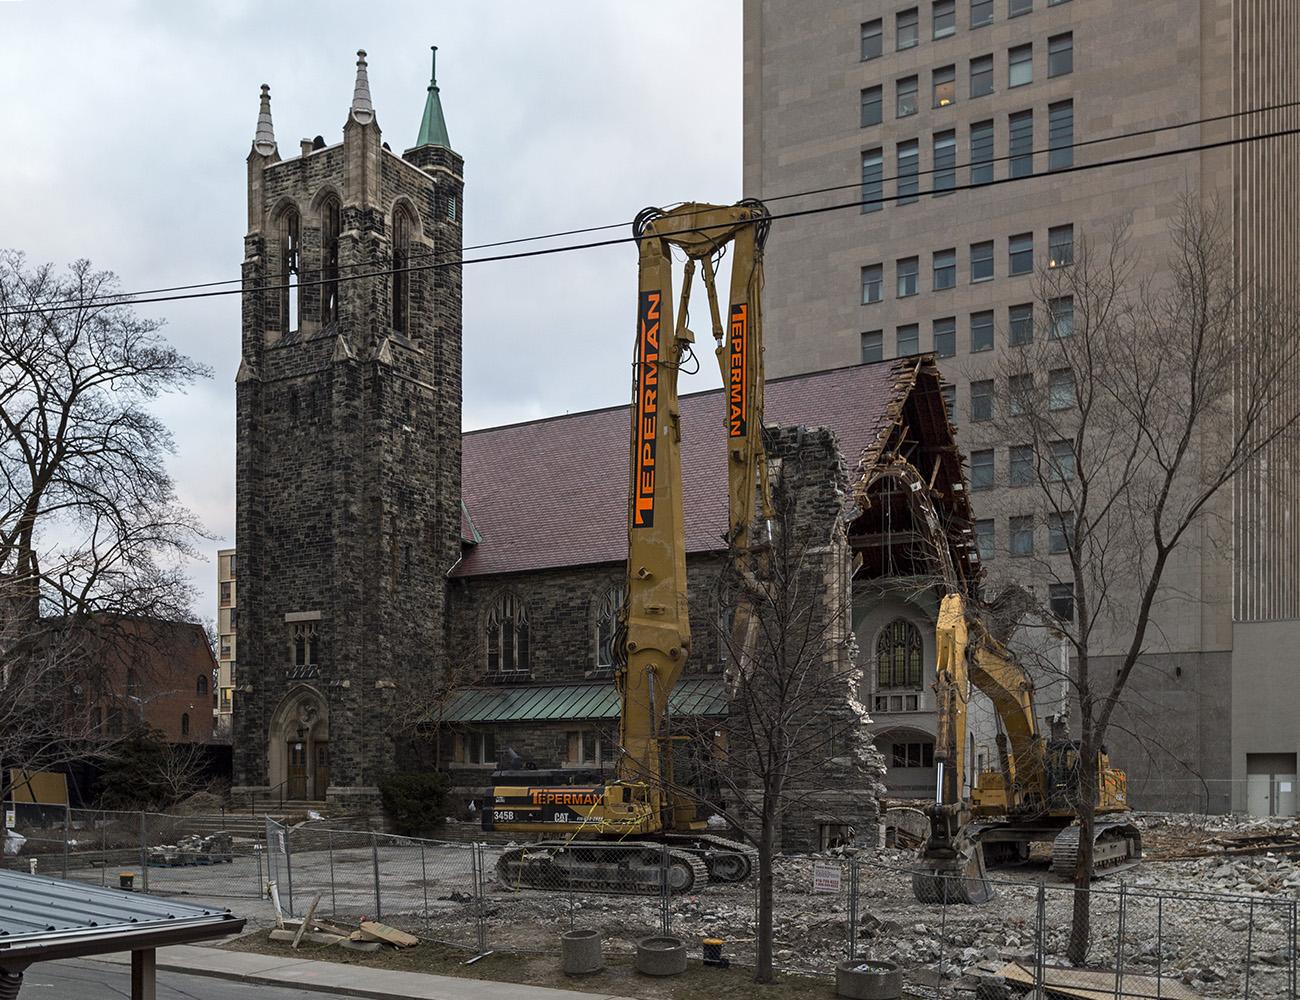 20170116. The 1912 Gothic Revival Deer Park United Church awaits